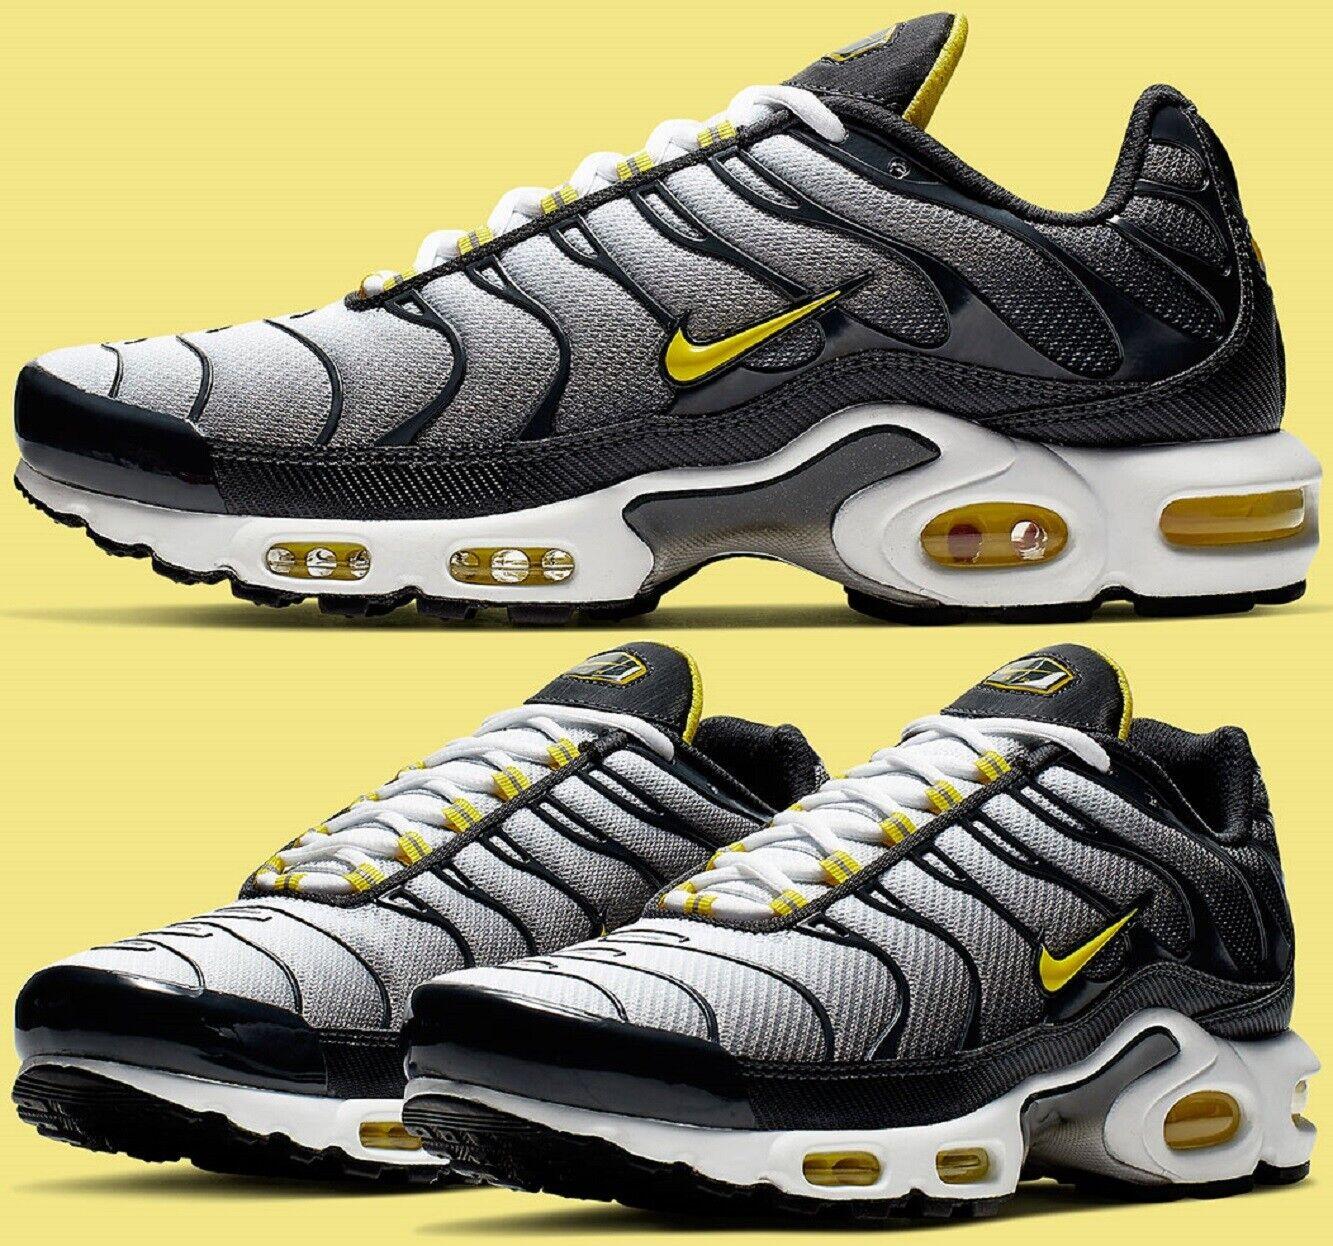 Nike Air Max Plus scarpe da ginnastica Men's Lifestyle scarpe Bumble Bee